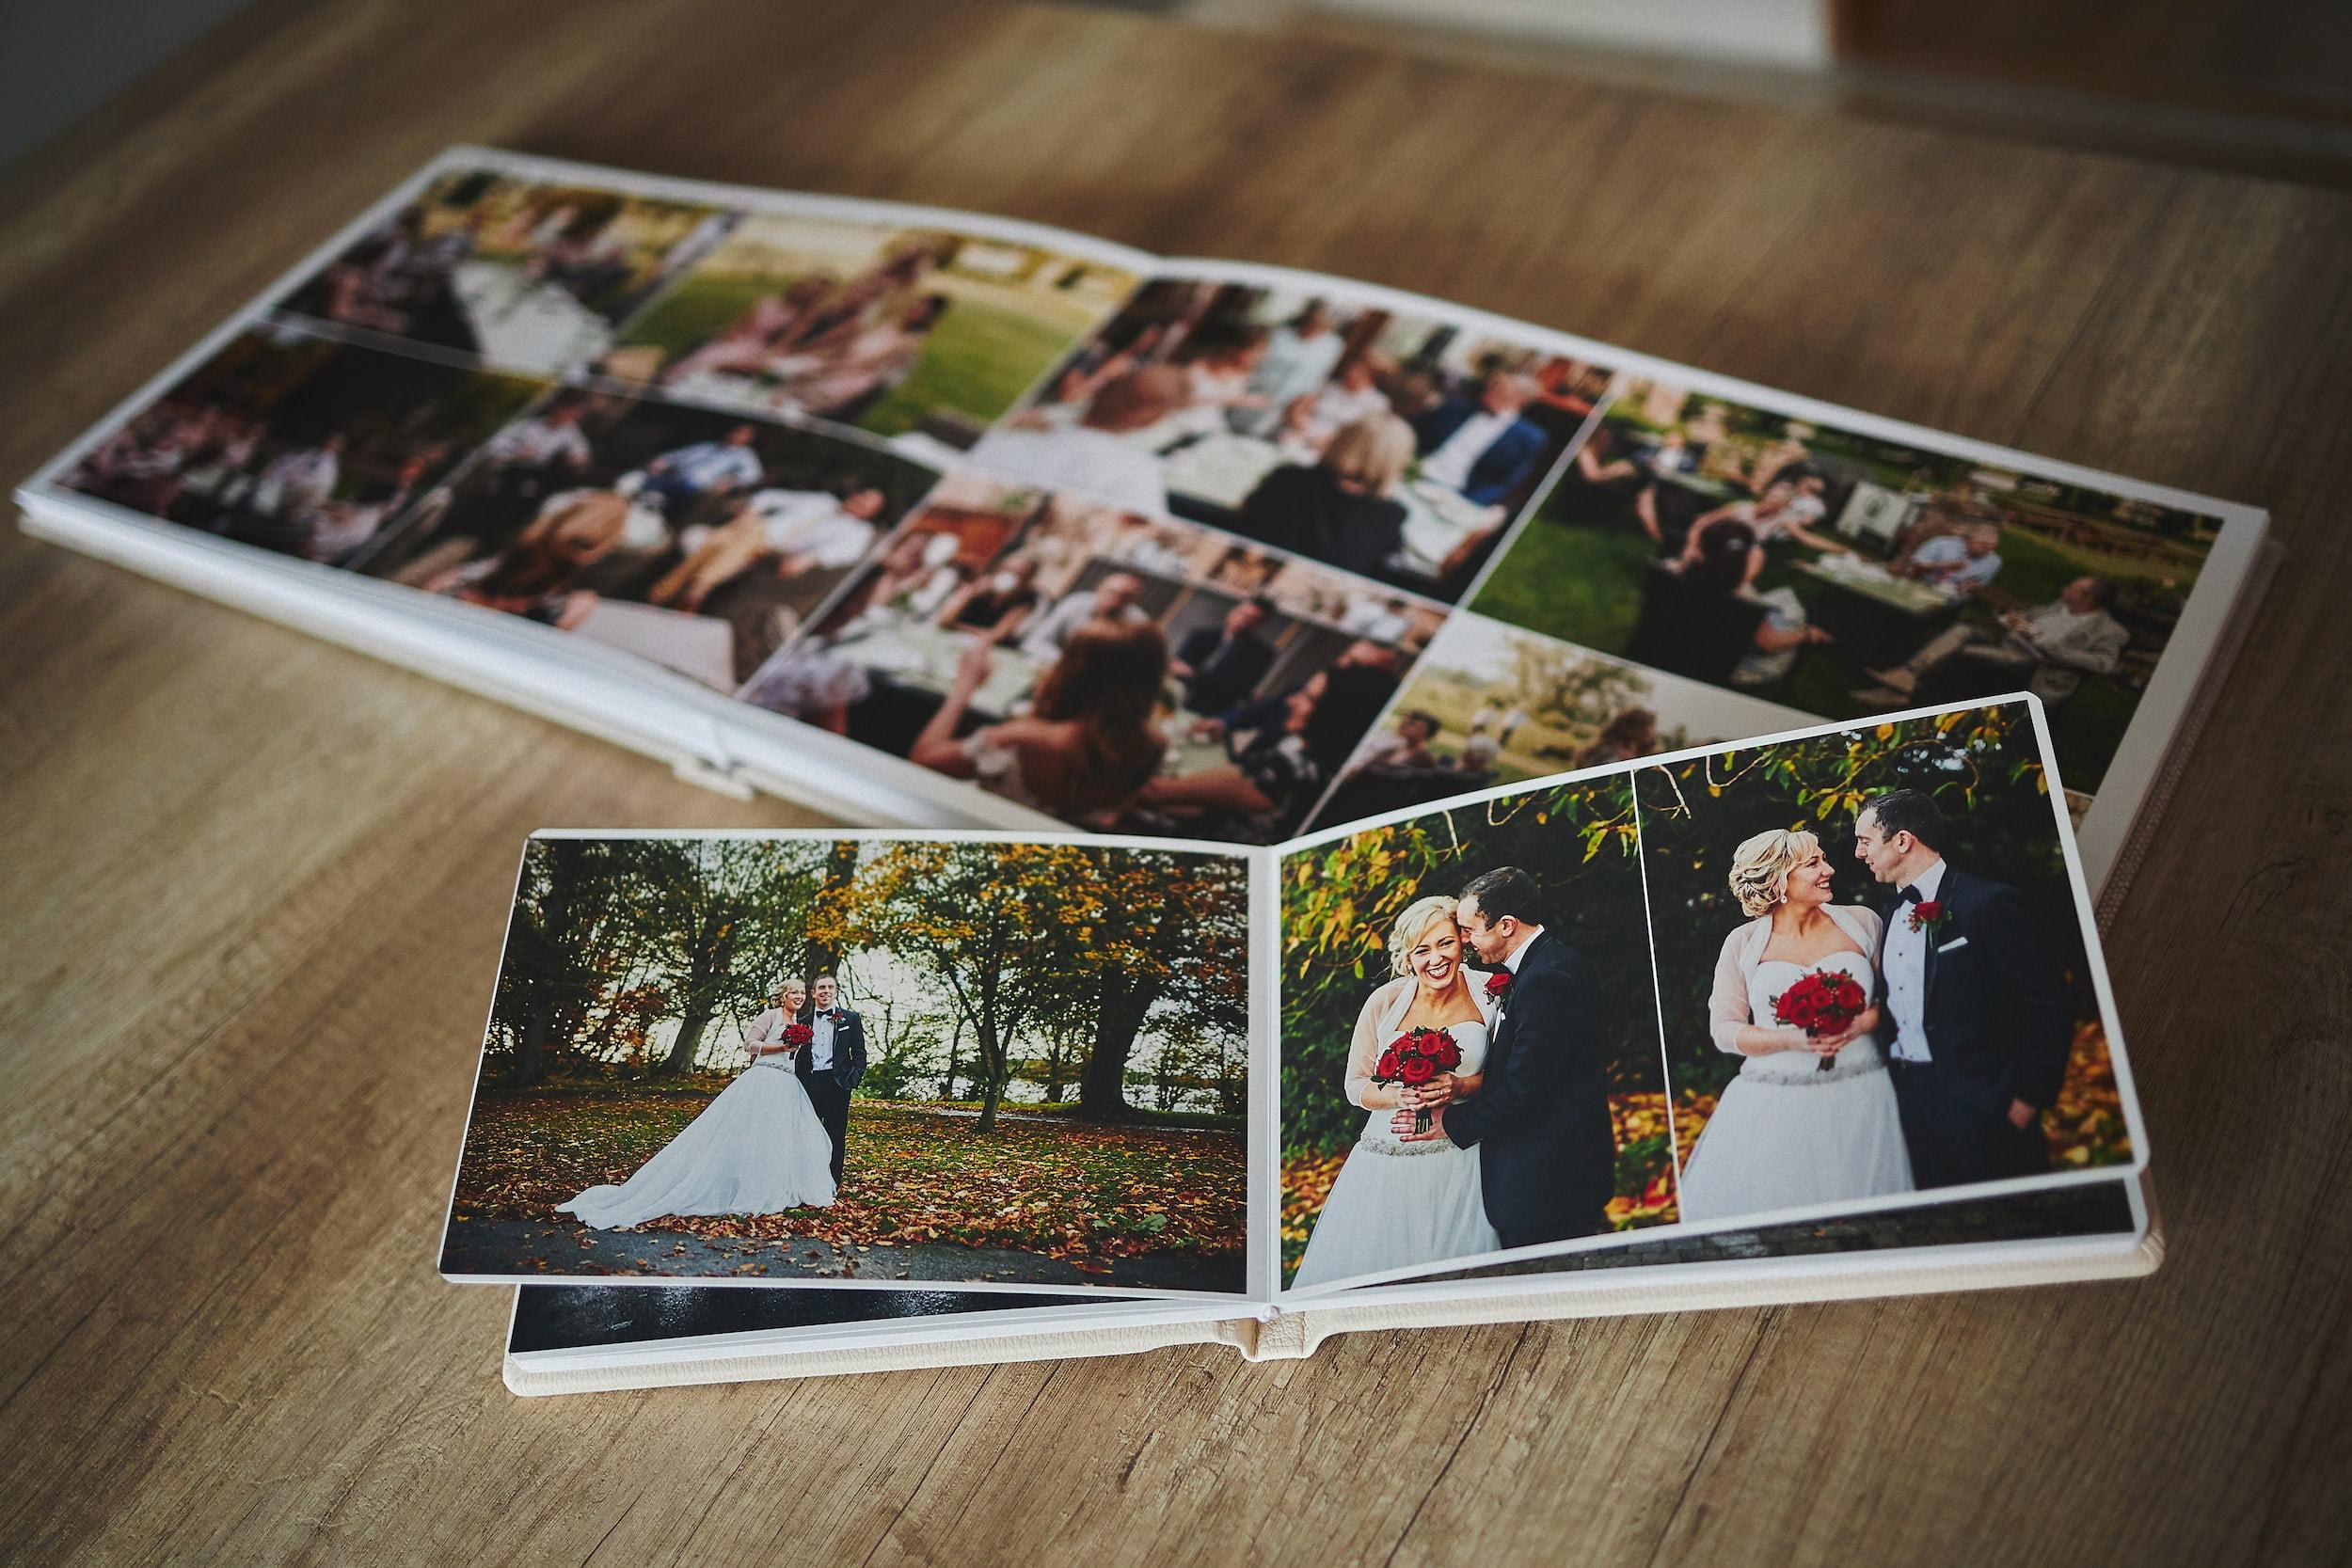 wedding-albums-ireland-00134 40